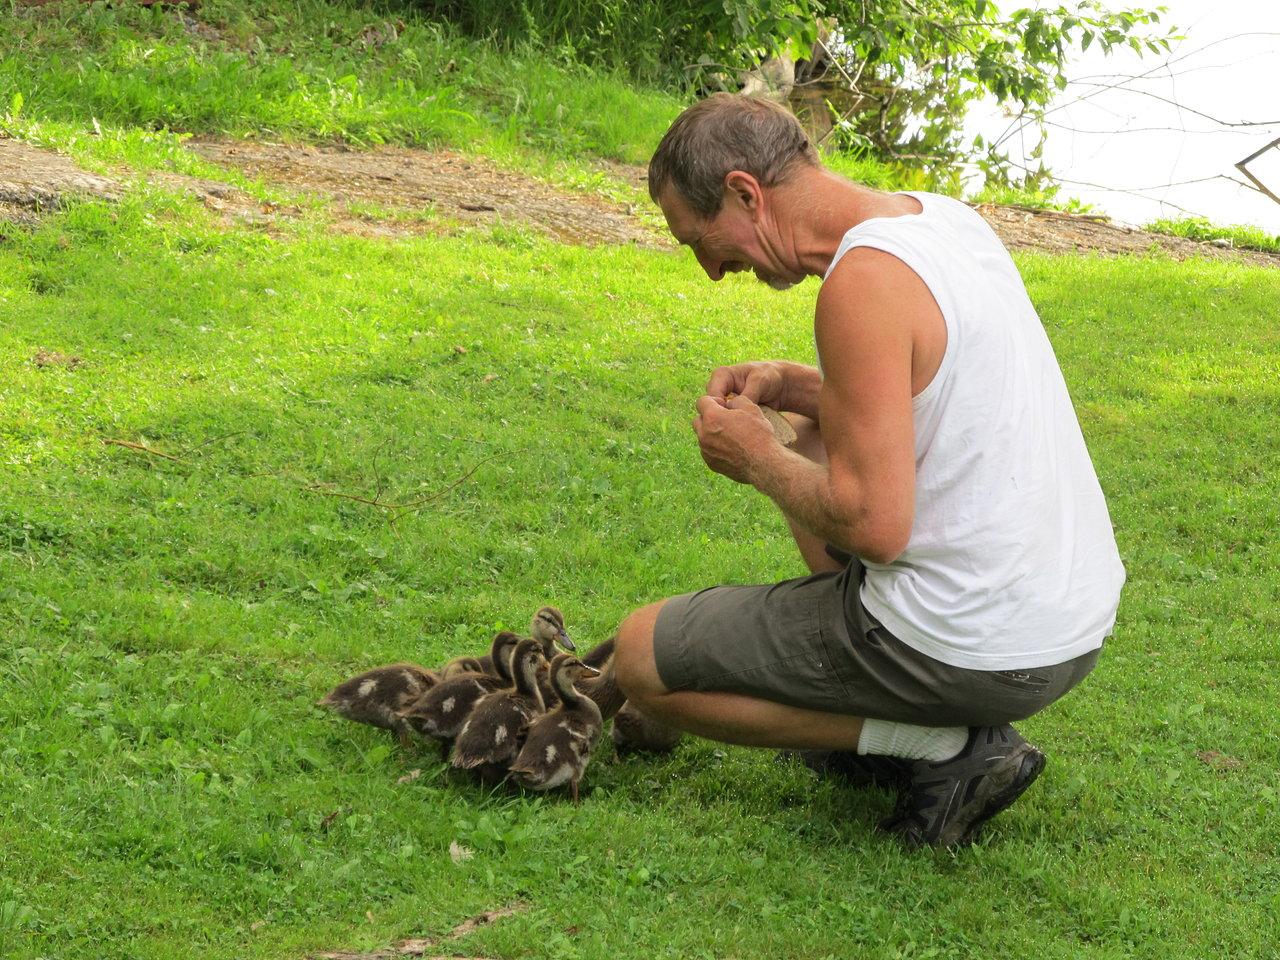 Feeding the Ducklings